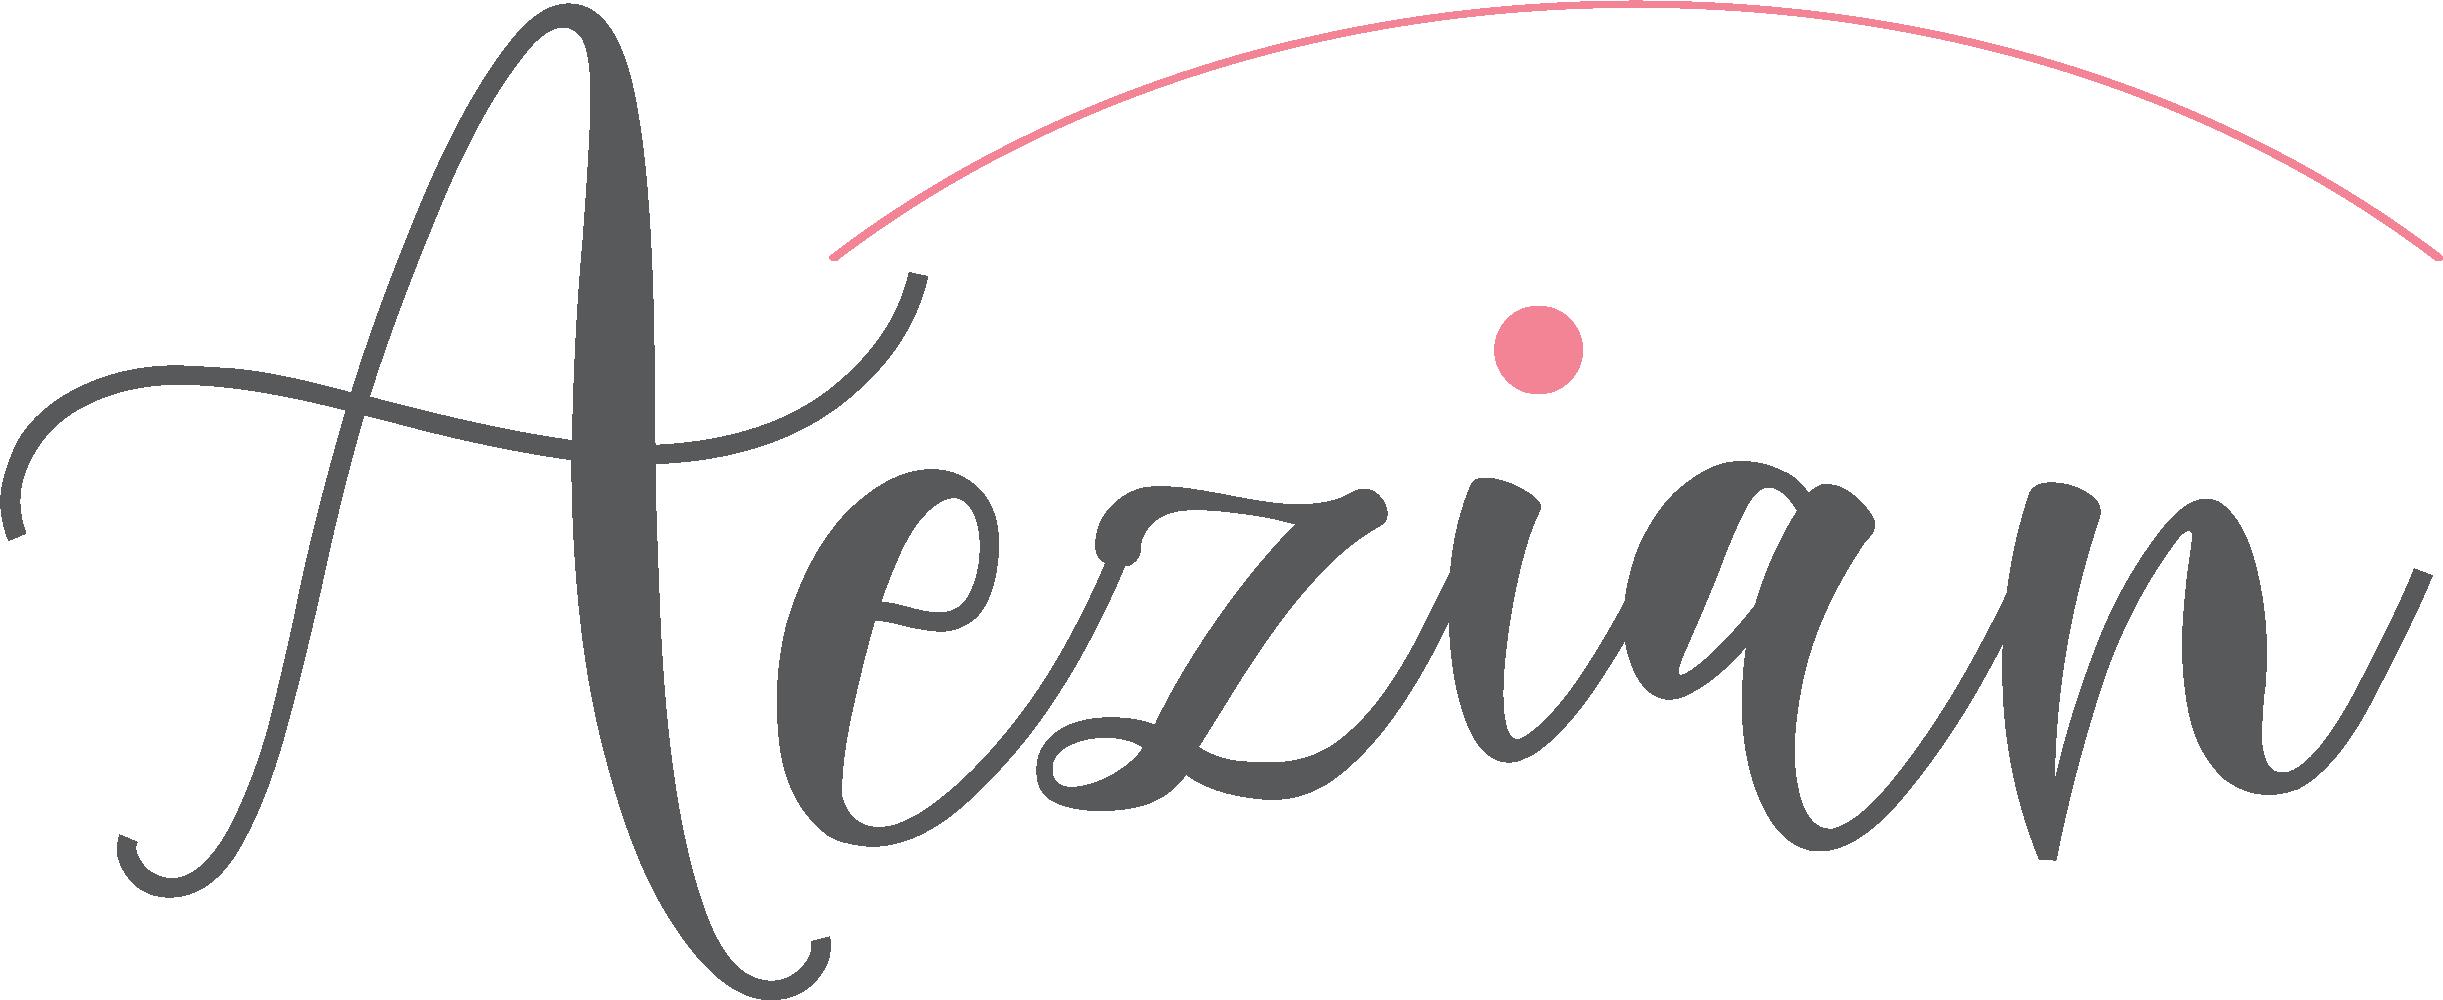 Aezian Co., Ltd.